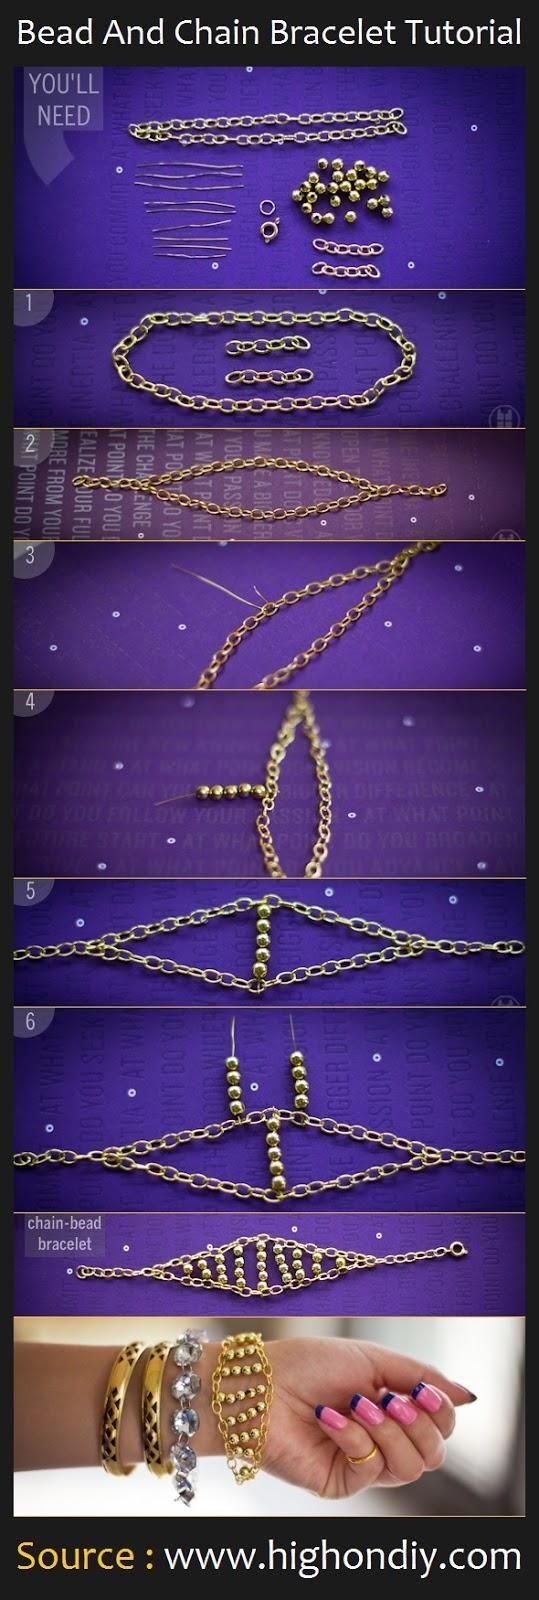 Bead And Chain Bracelet DIY